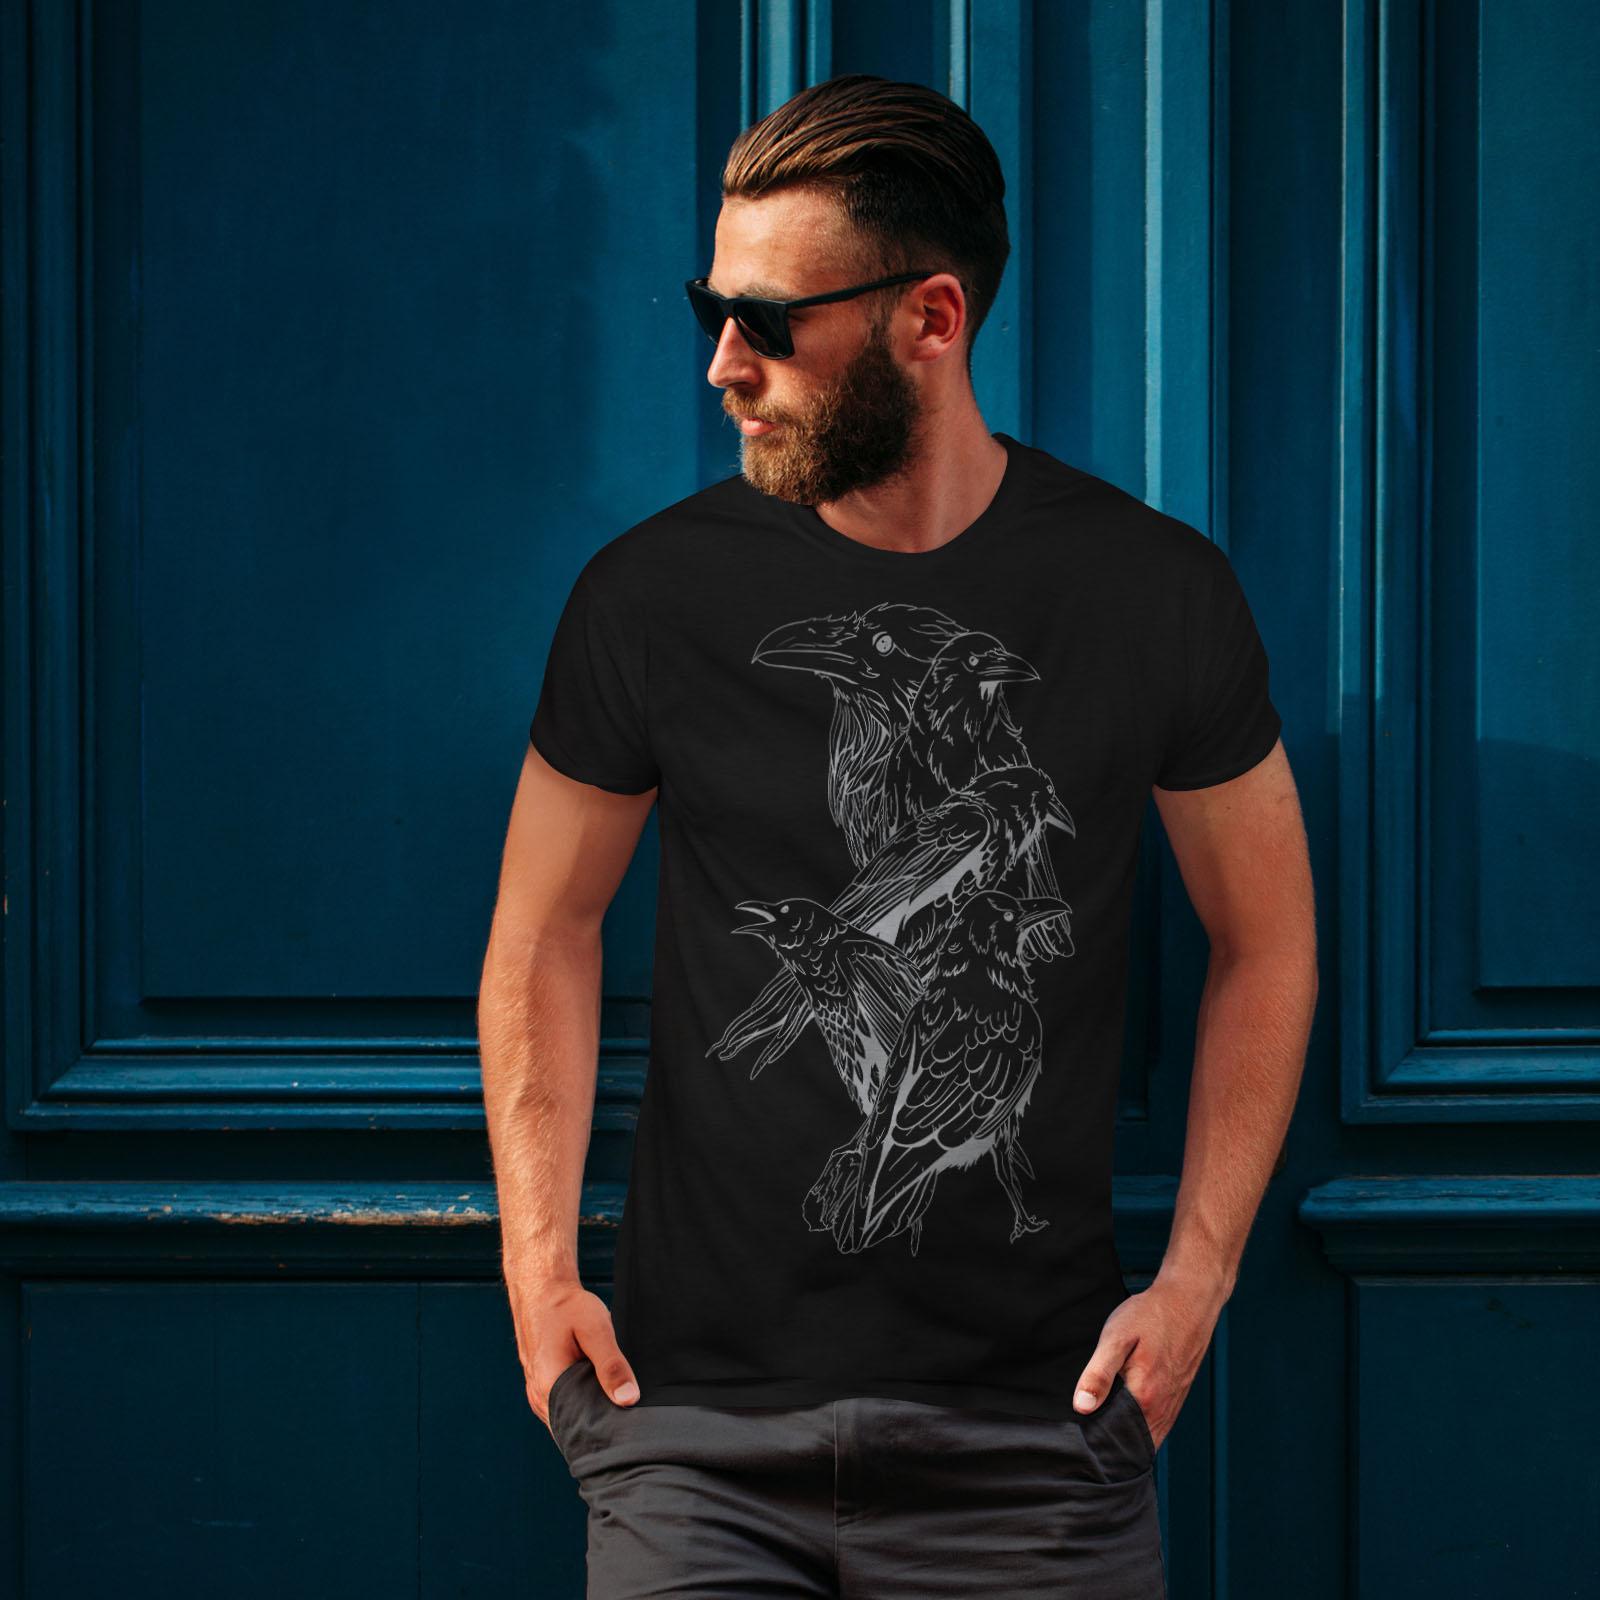 miniature 4 - Wellcoda Four Scary Raven Mens T-shirt, Crow Birds Graphic Design Printed Tee